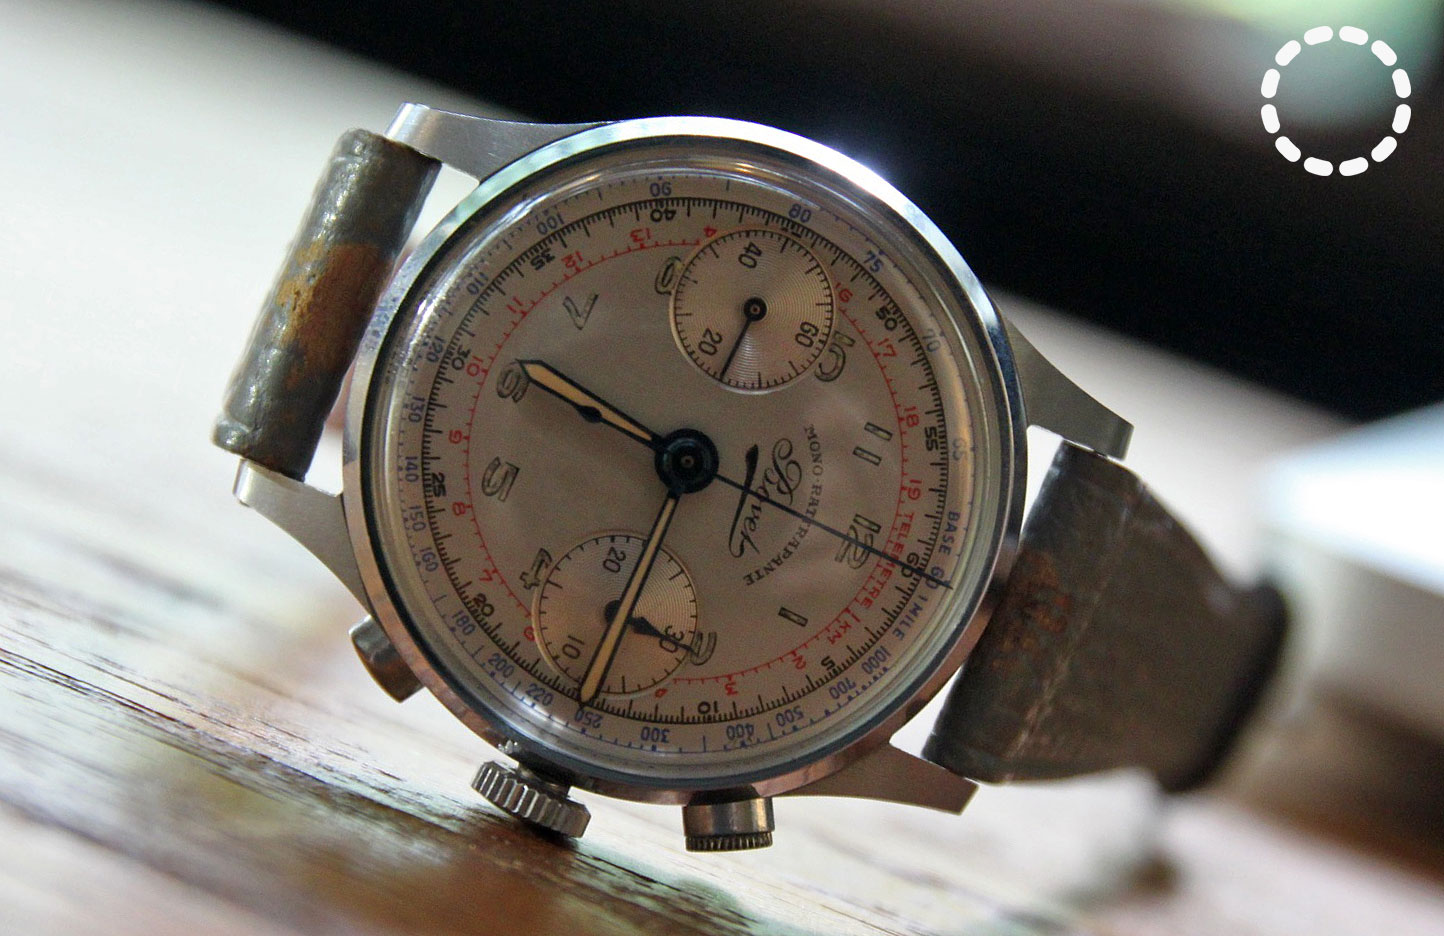 Bovet Mono-Rattrapante Chronograph 1